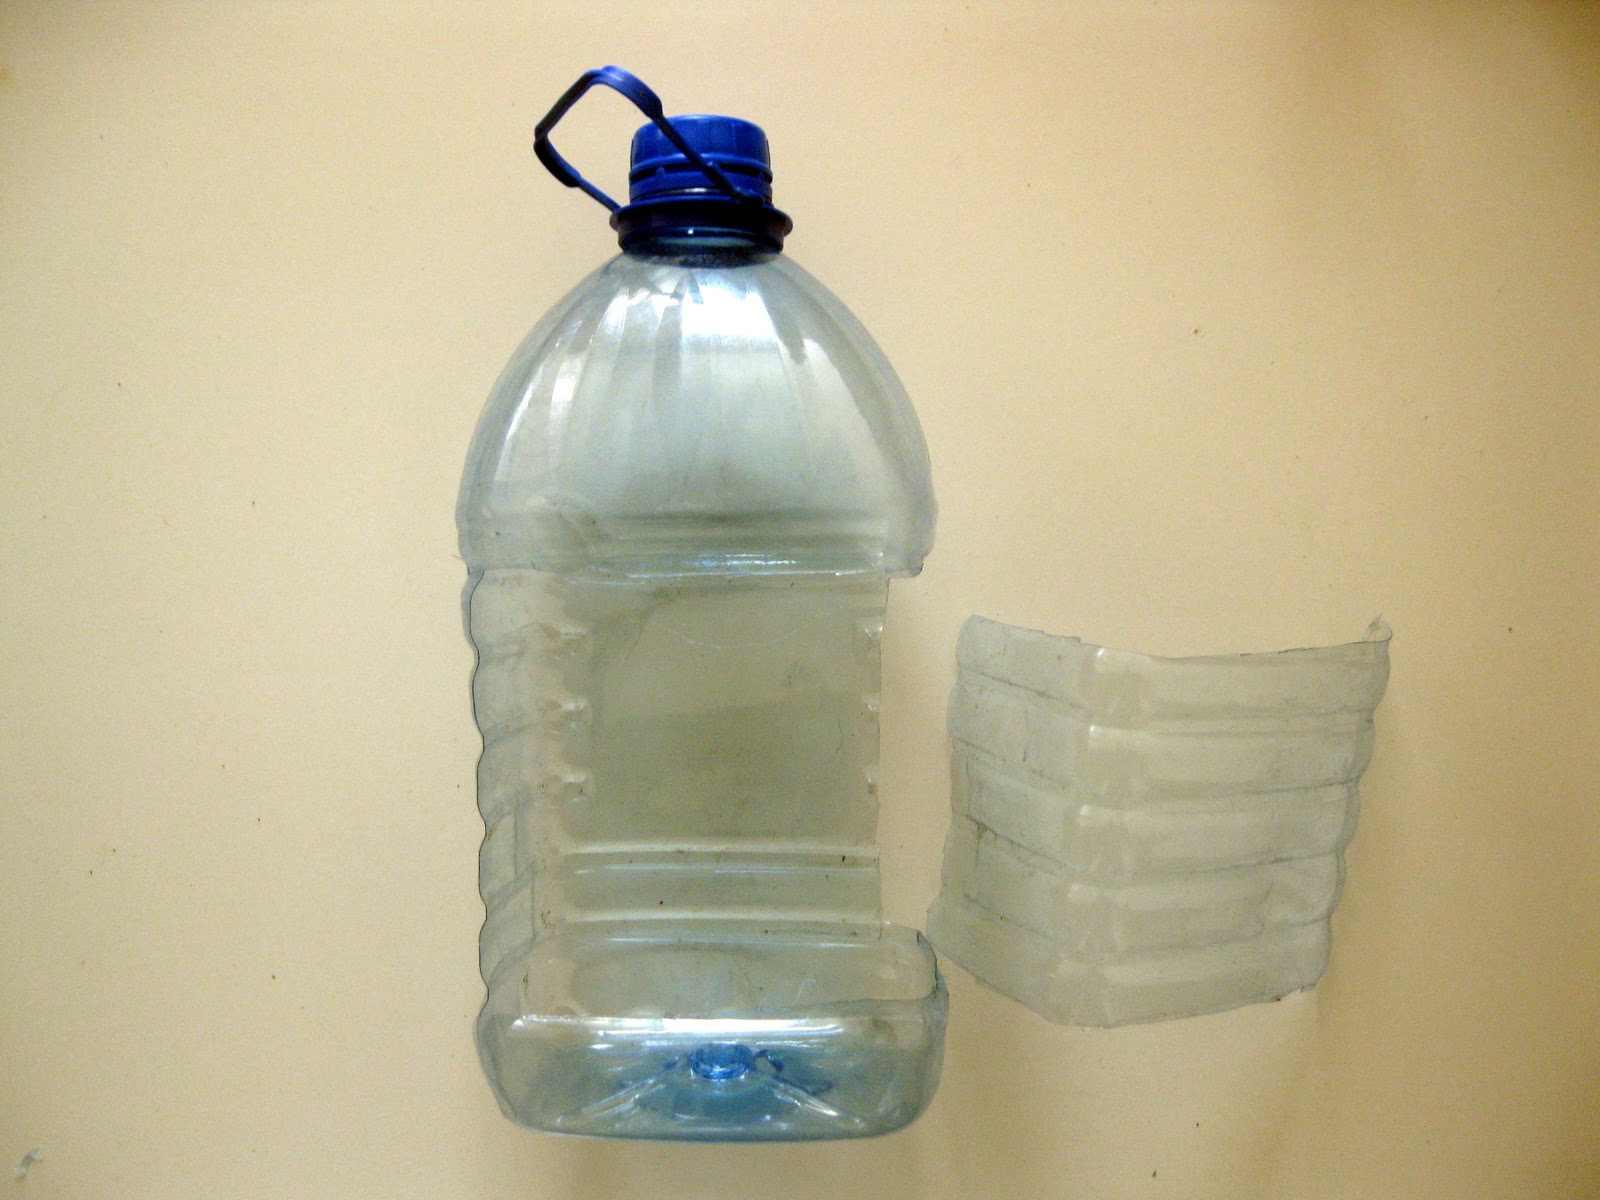 Кормушки из пластиковой бутылки своими руками фото